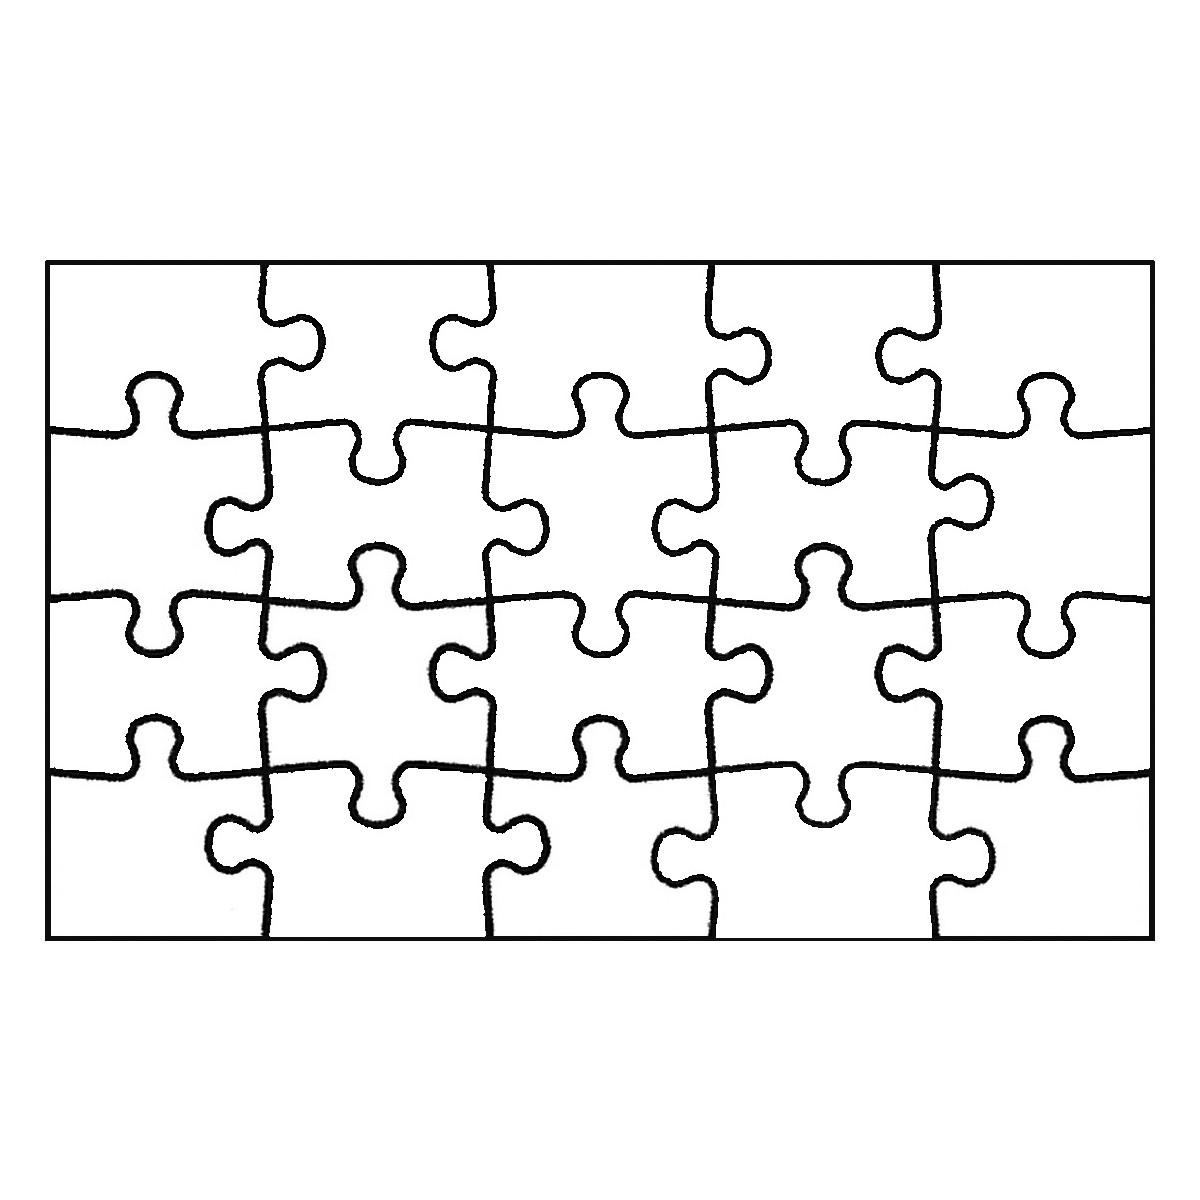 joypac white line puzzle postkarte zum selbst bemalen 6 st ck. Black Bedroom Furniture Sets. Home Design Ideas